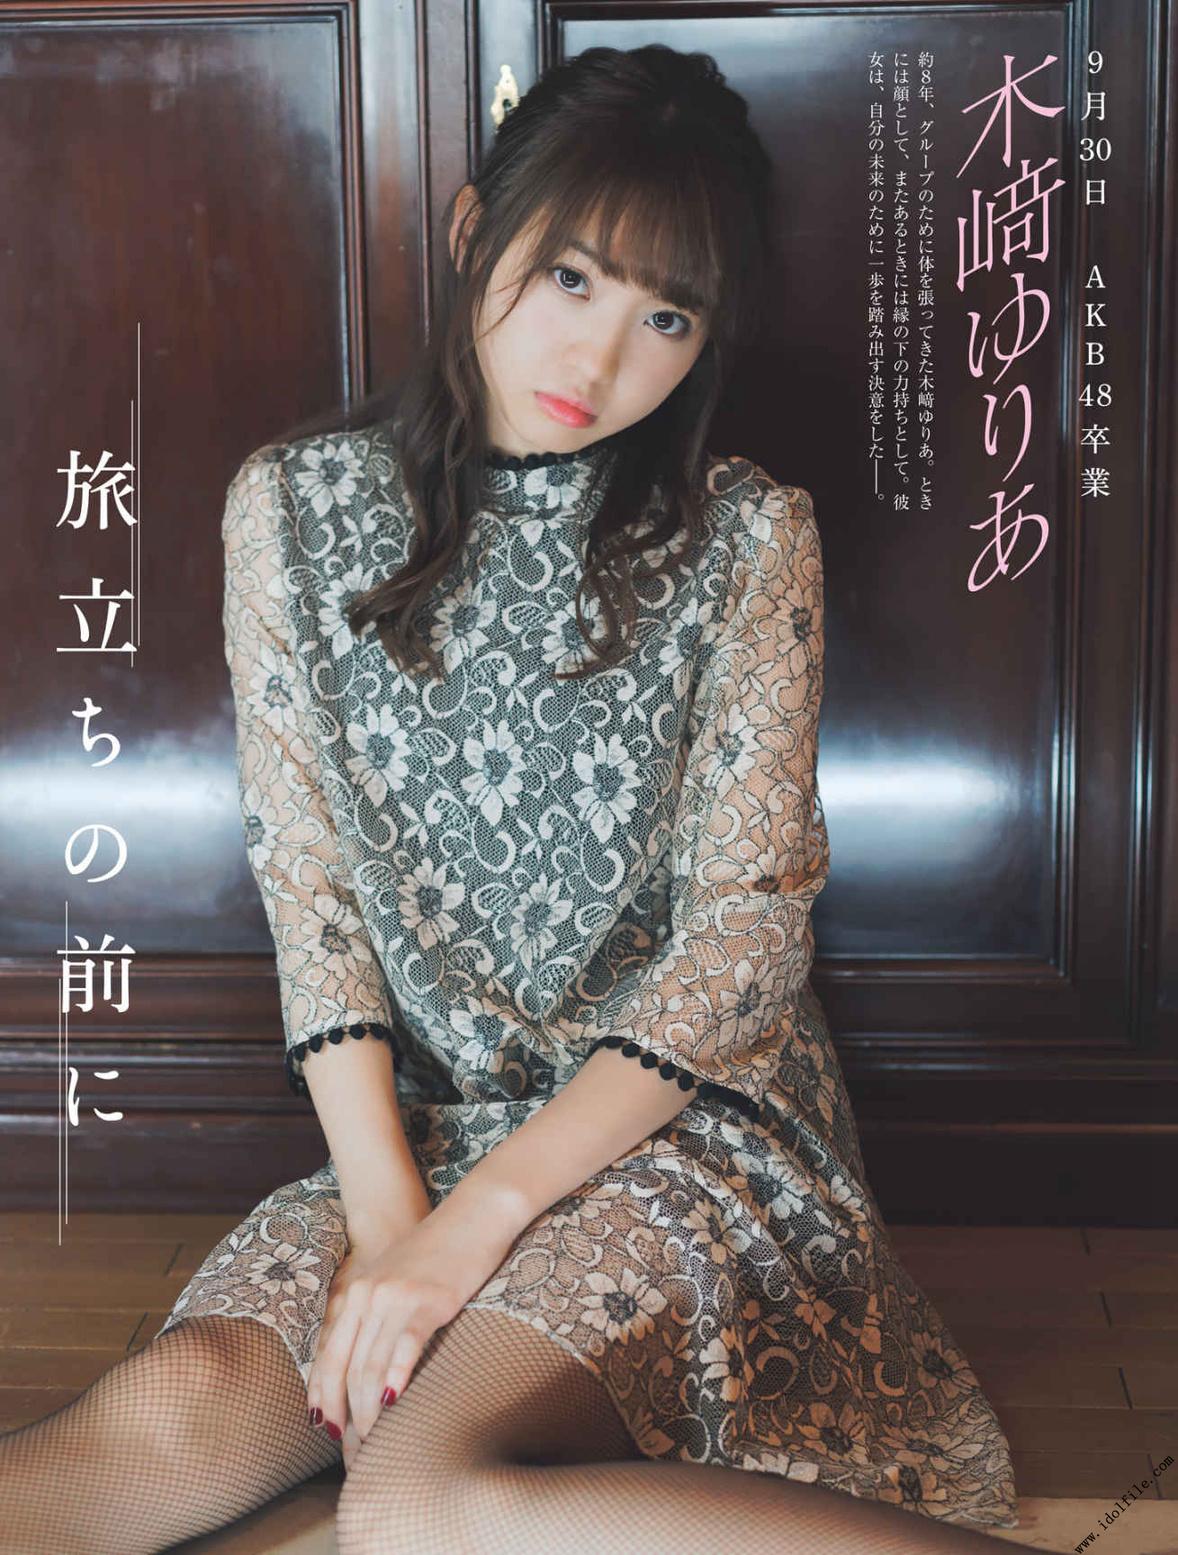 Kizaki Yuria 木﨑ゆりあ, Platinum FLASH 2017 Vol.01 (プラチナフラッシュ 2017 Vol.1)